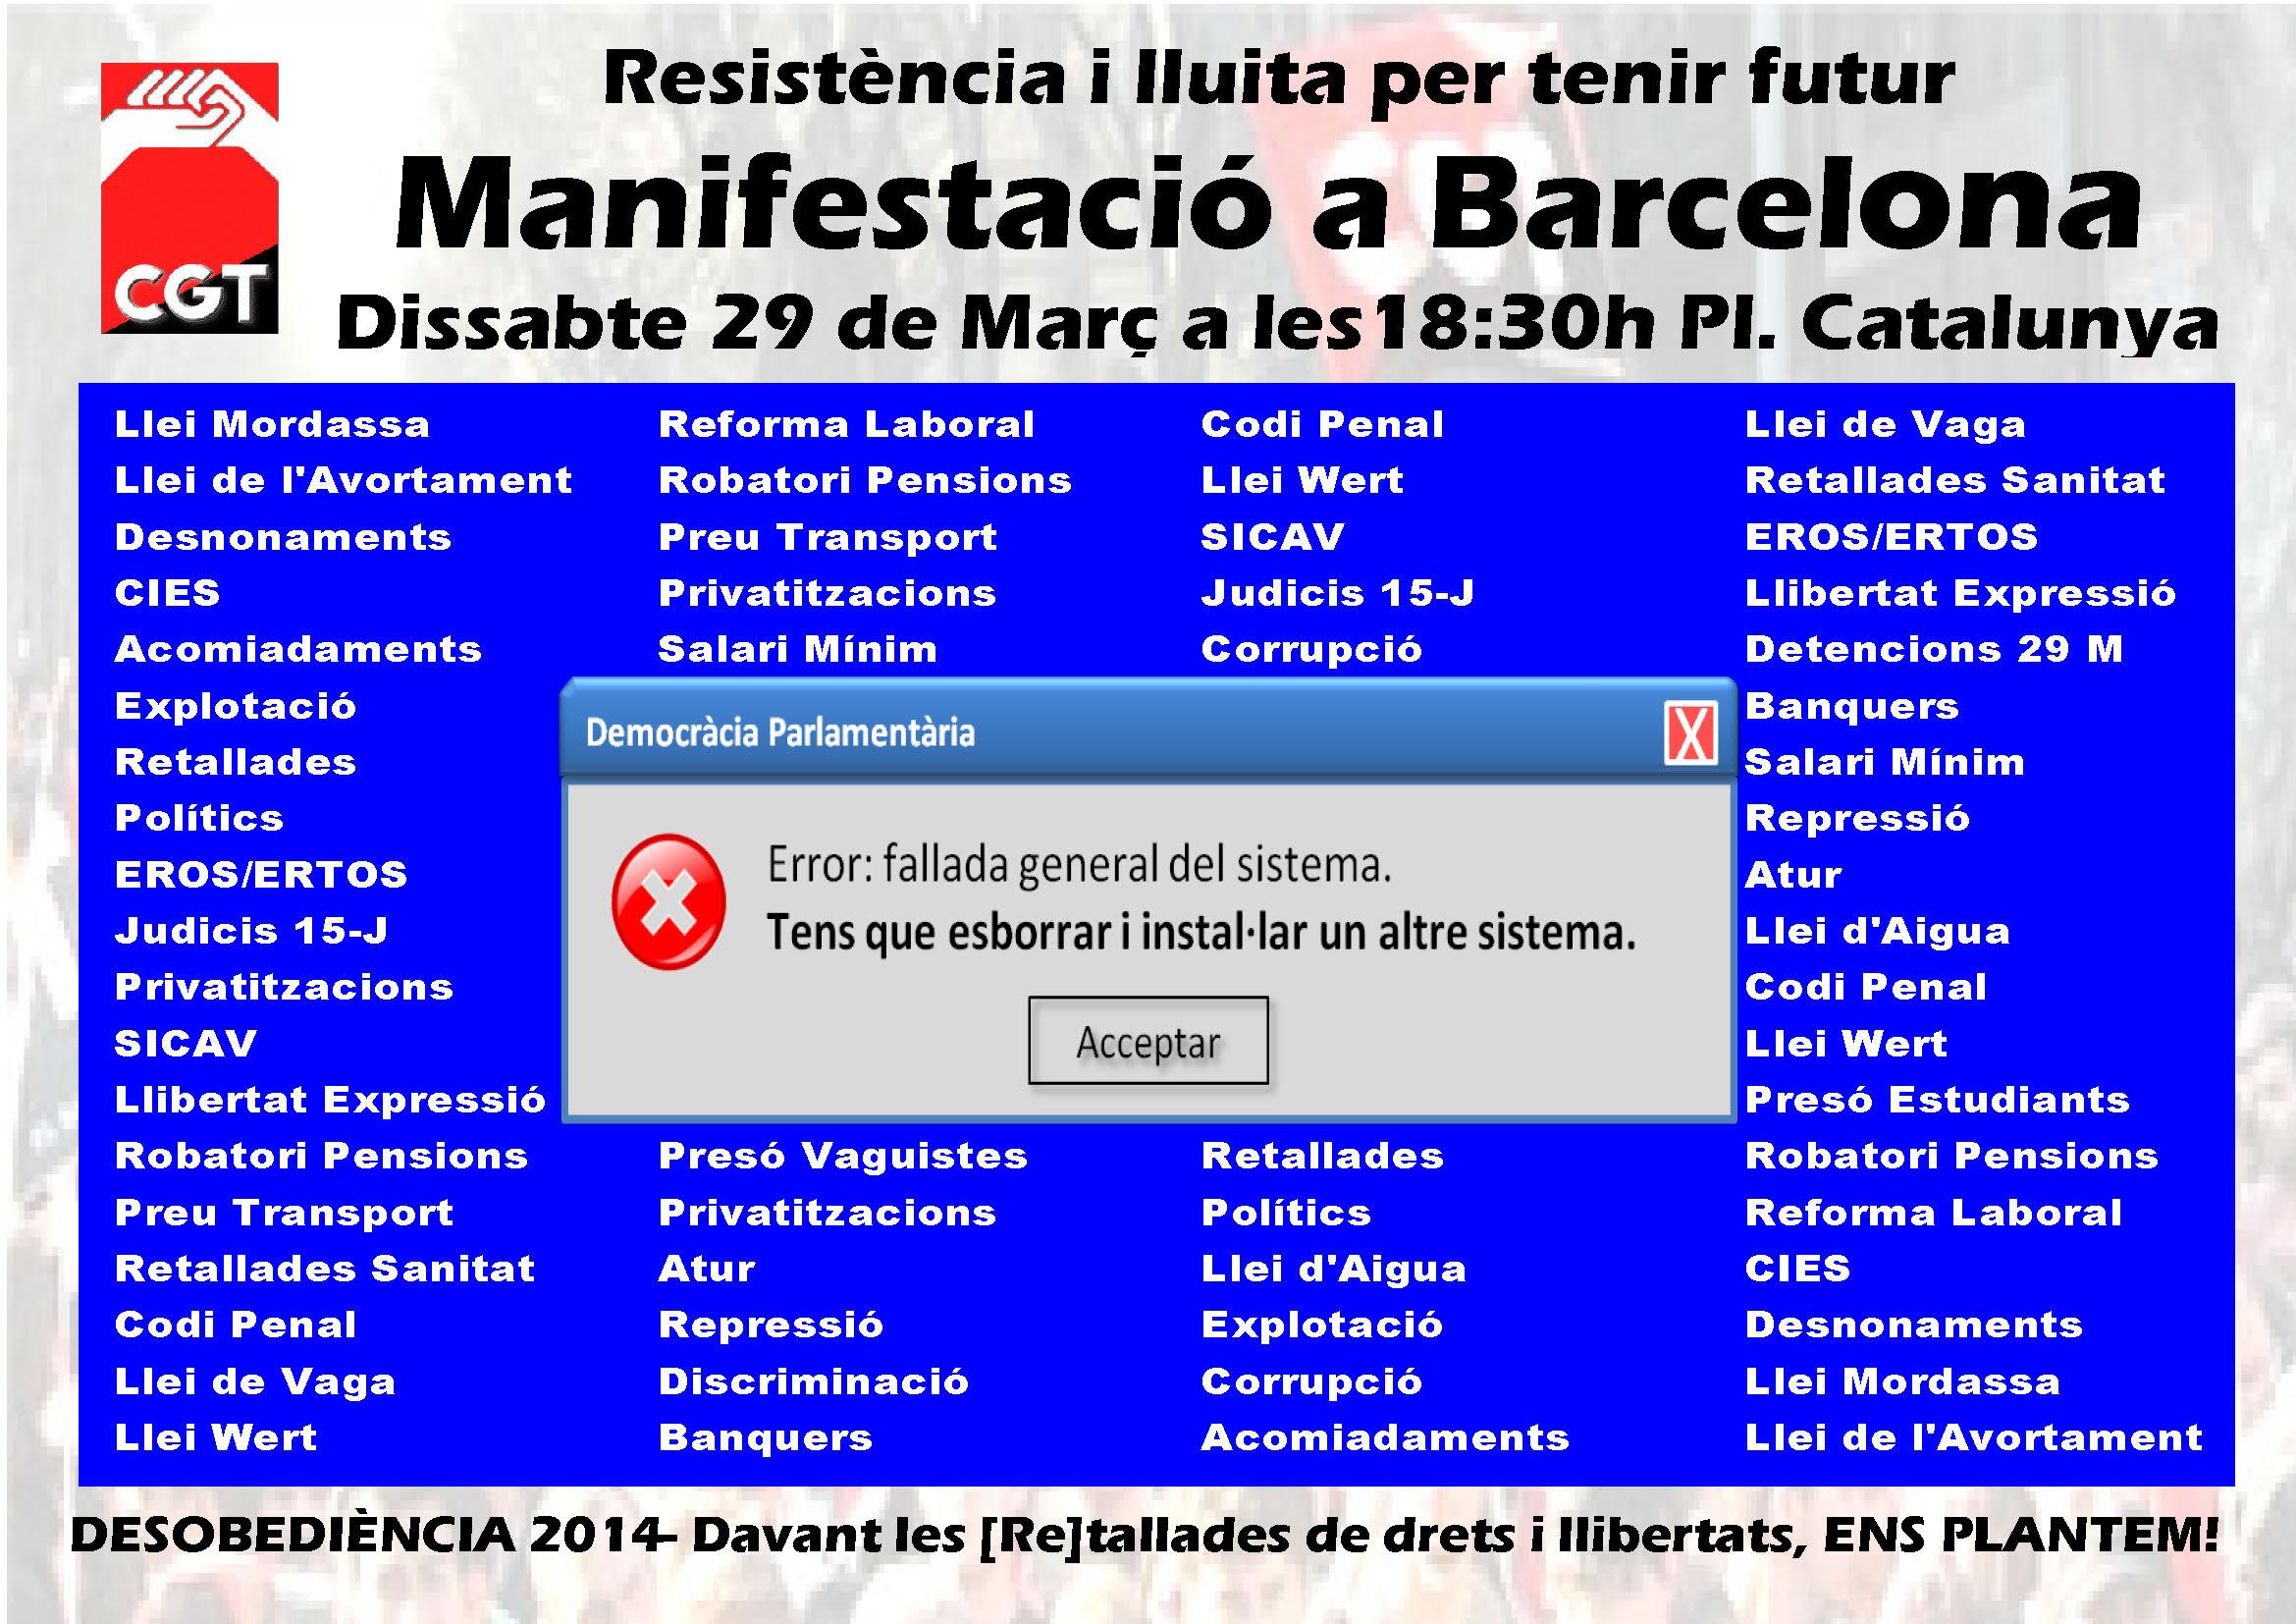 manifestacio_29_desobediencia_2014.jpg